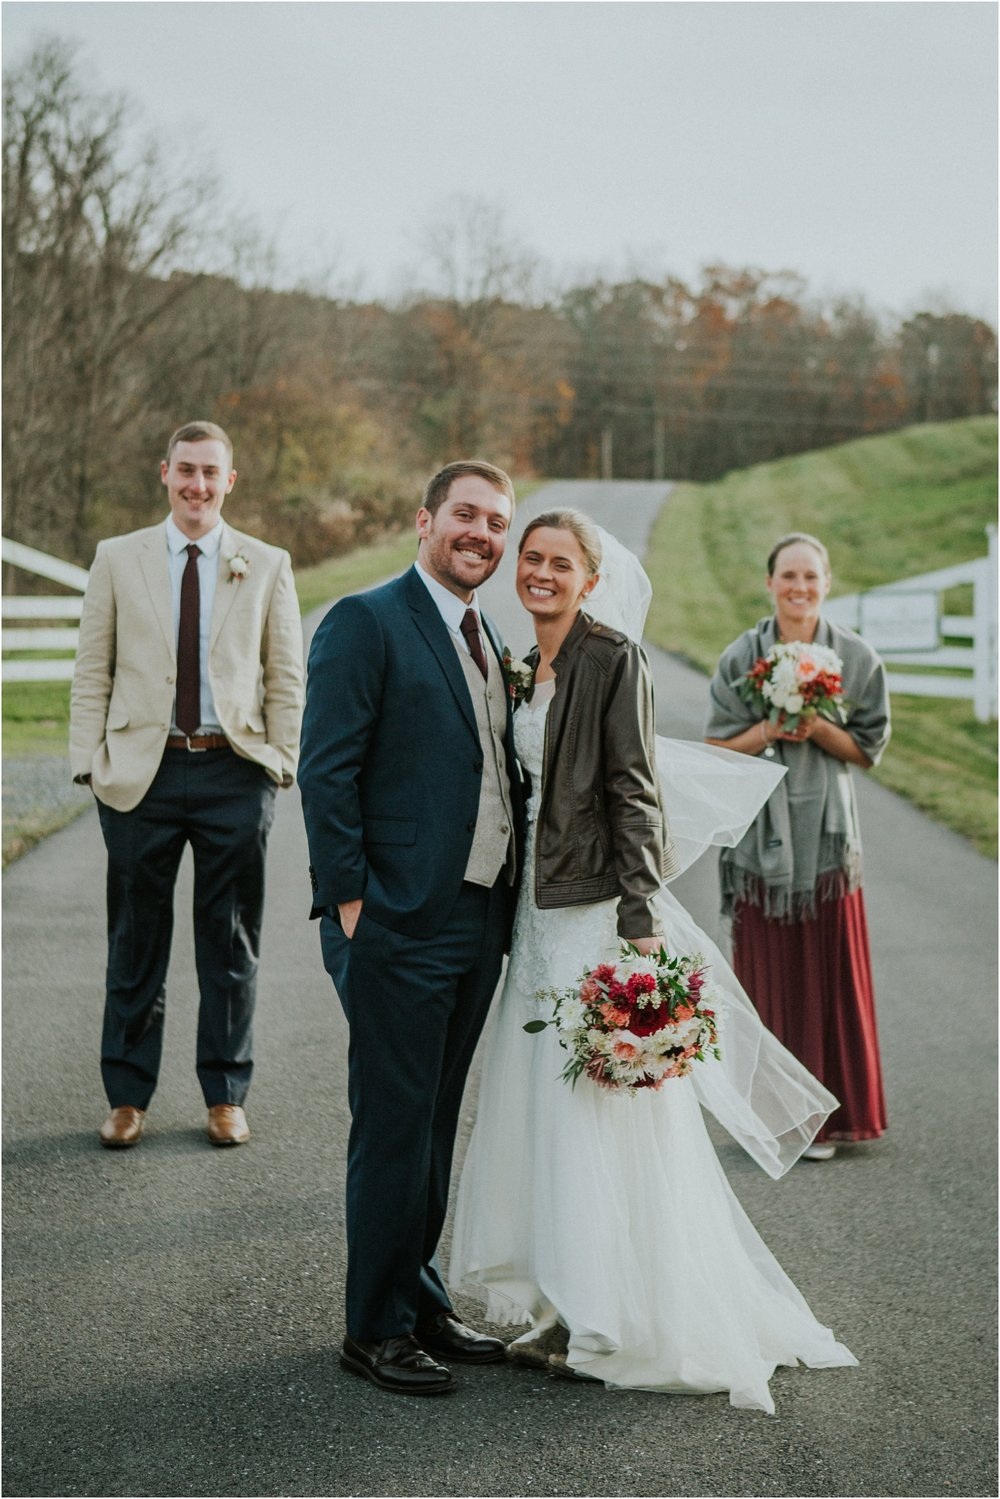 warm-springs-old-dairy-virginia-rustic-wedding-northeast-tennessee-elopement-adventuruous-photographer-katy-sergent_0067.jpg